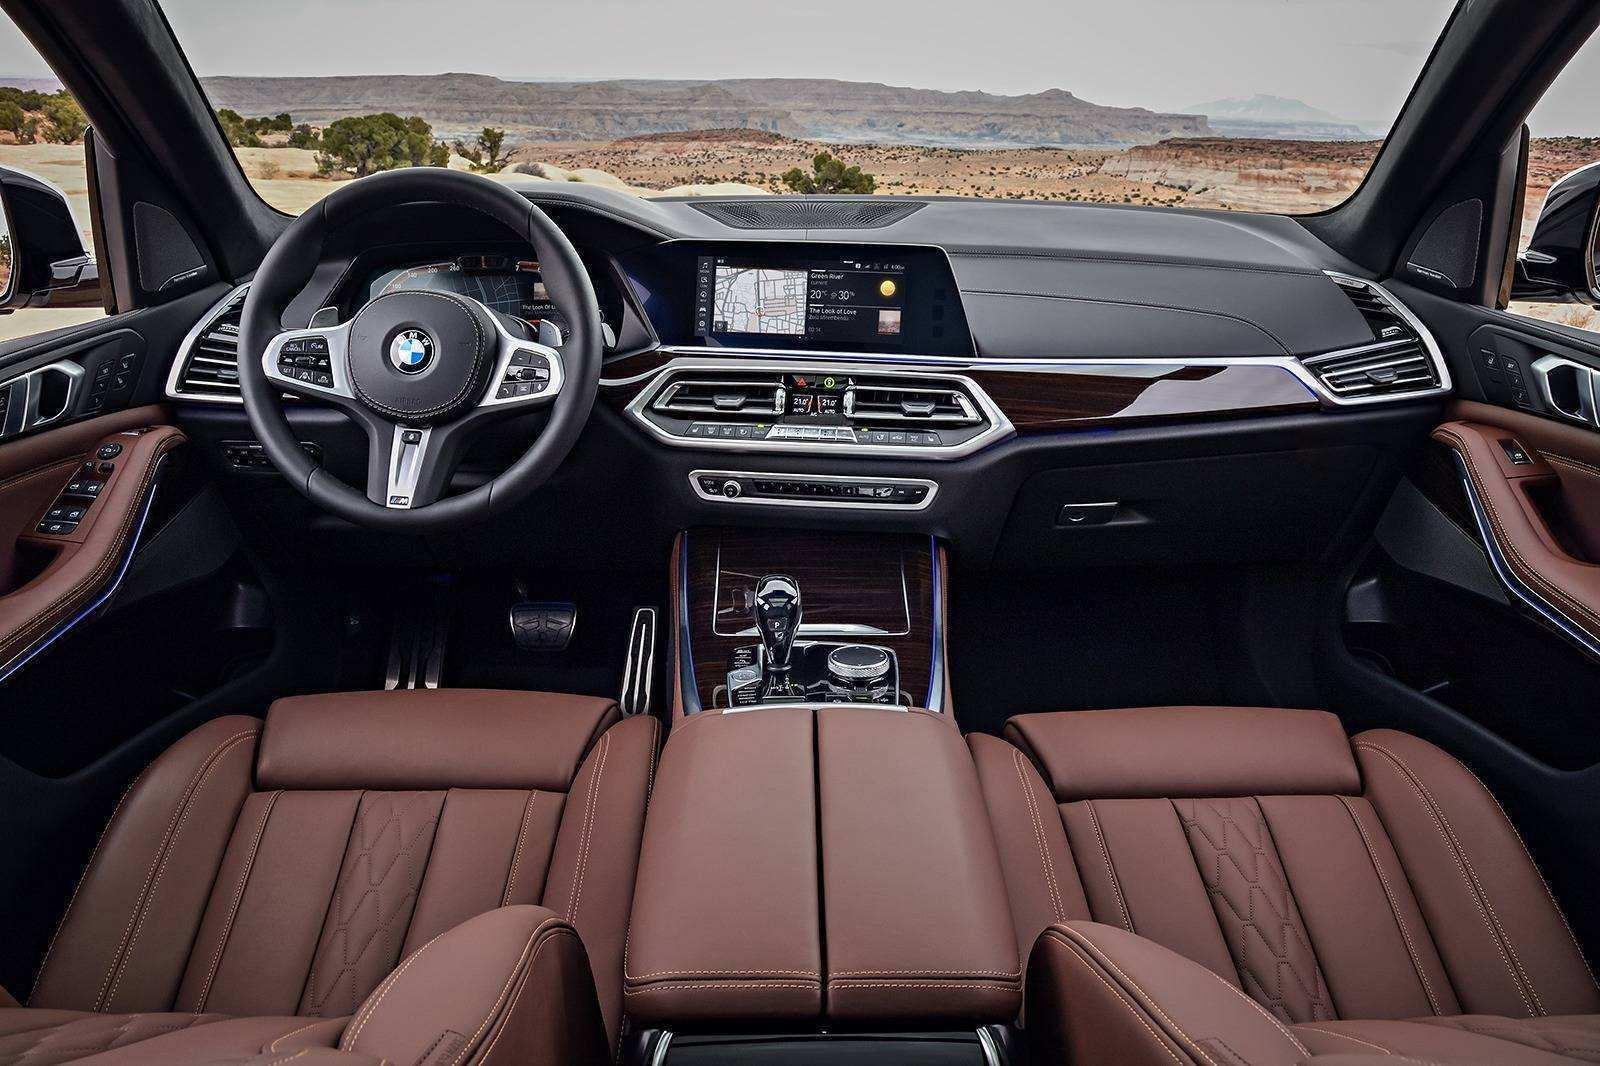 22 New Bmw X5 2019 Price Usa First Drive Price Performance And Review Model with Bmw X5 2019 Price Usa First Drive Price Performance And Review